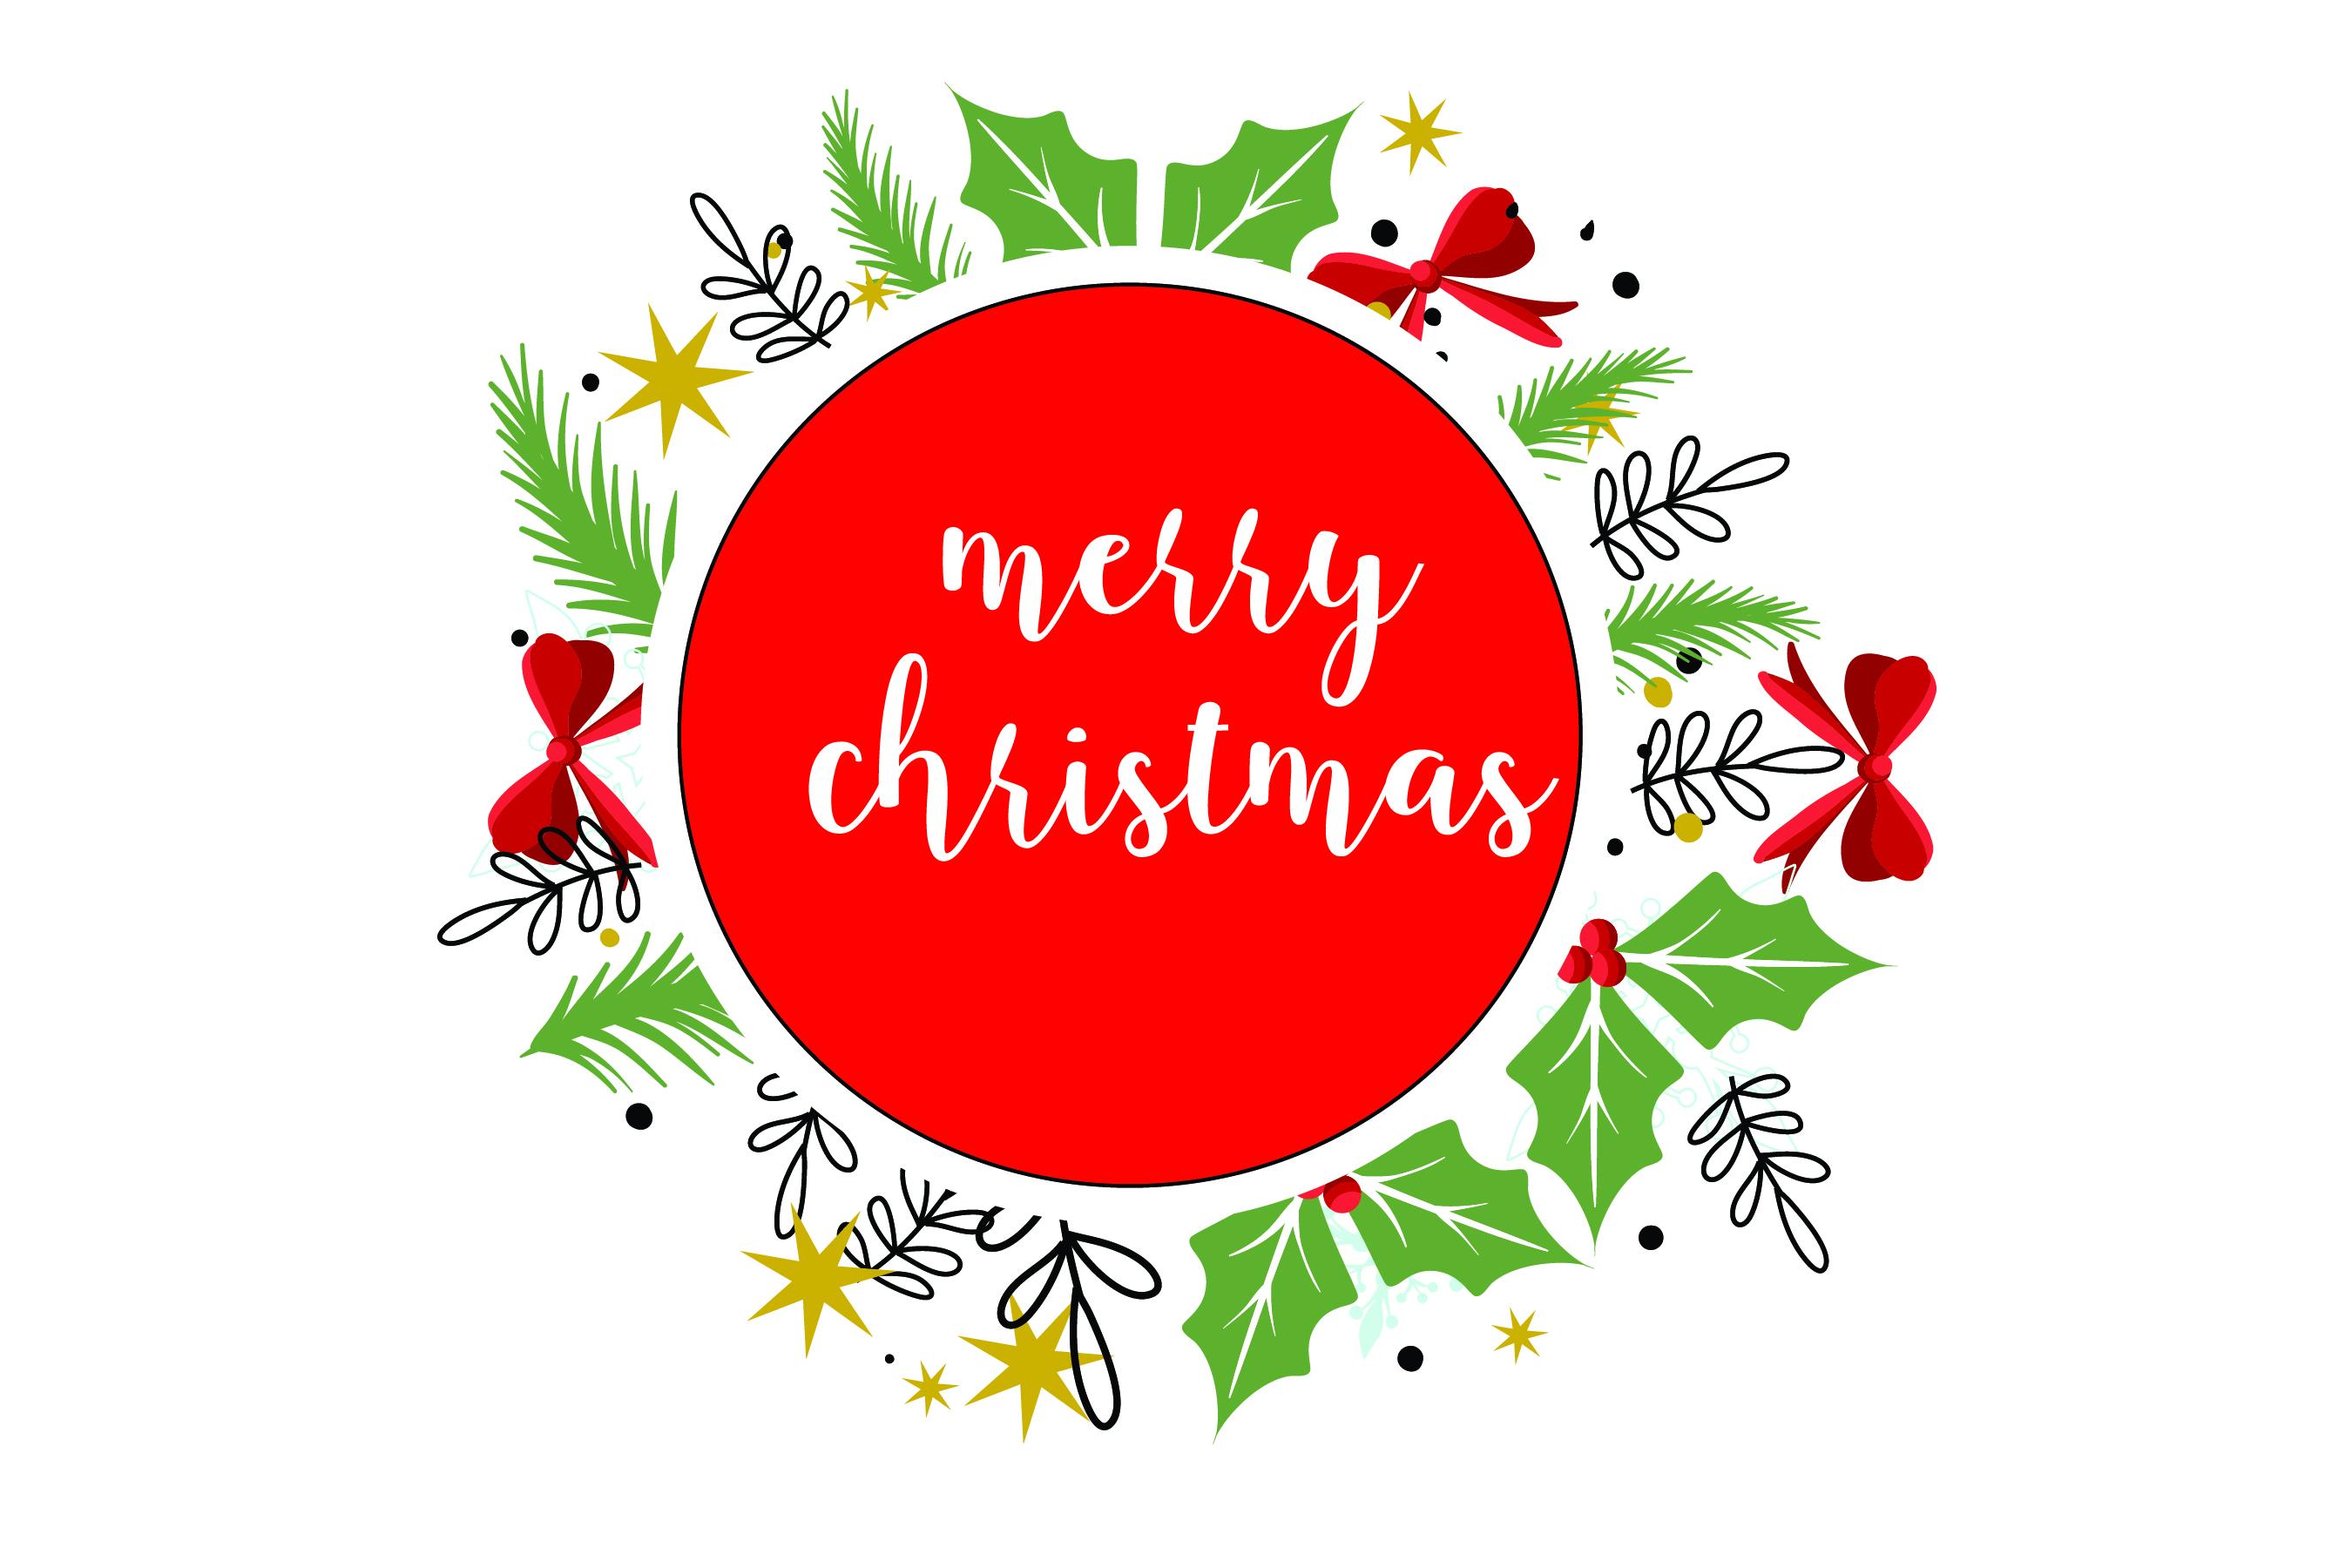 Merry Christmas-SVG Cut File-Coffee Mug Design-Greeting Card example image 4